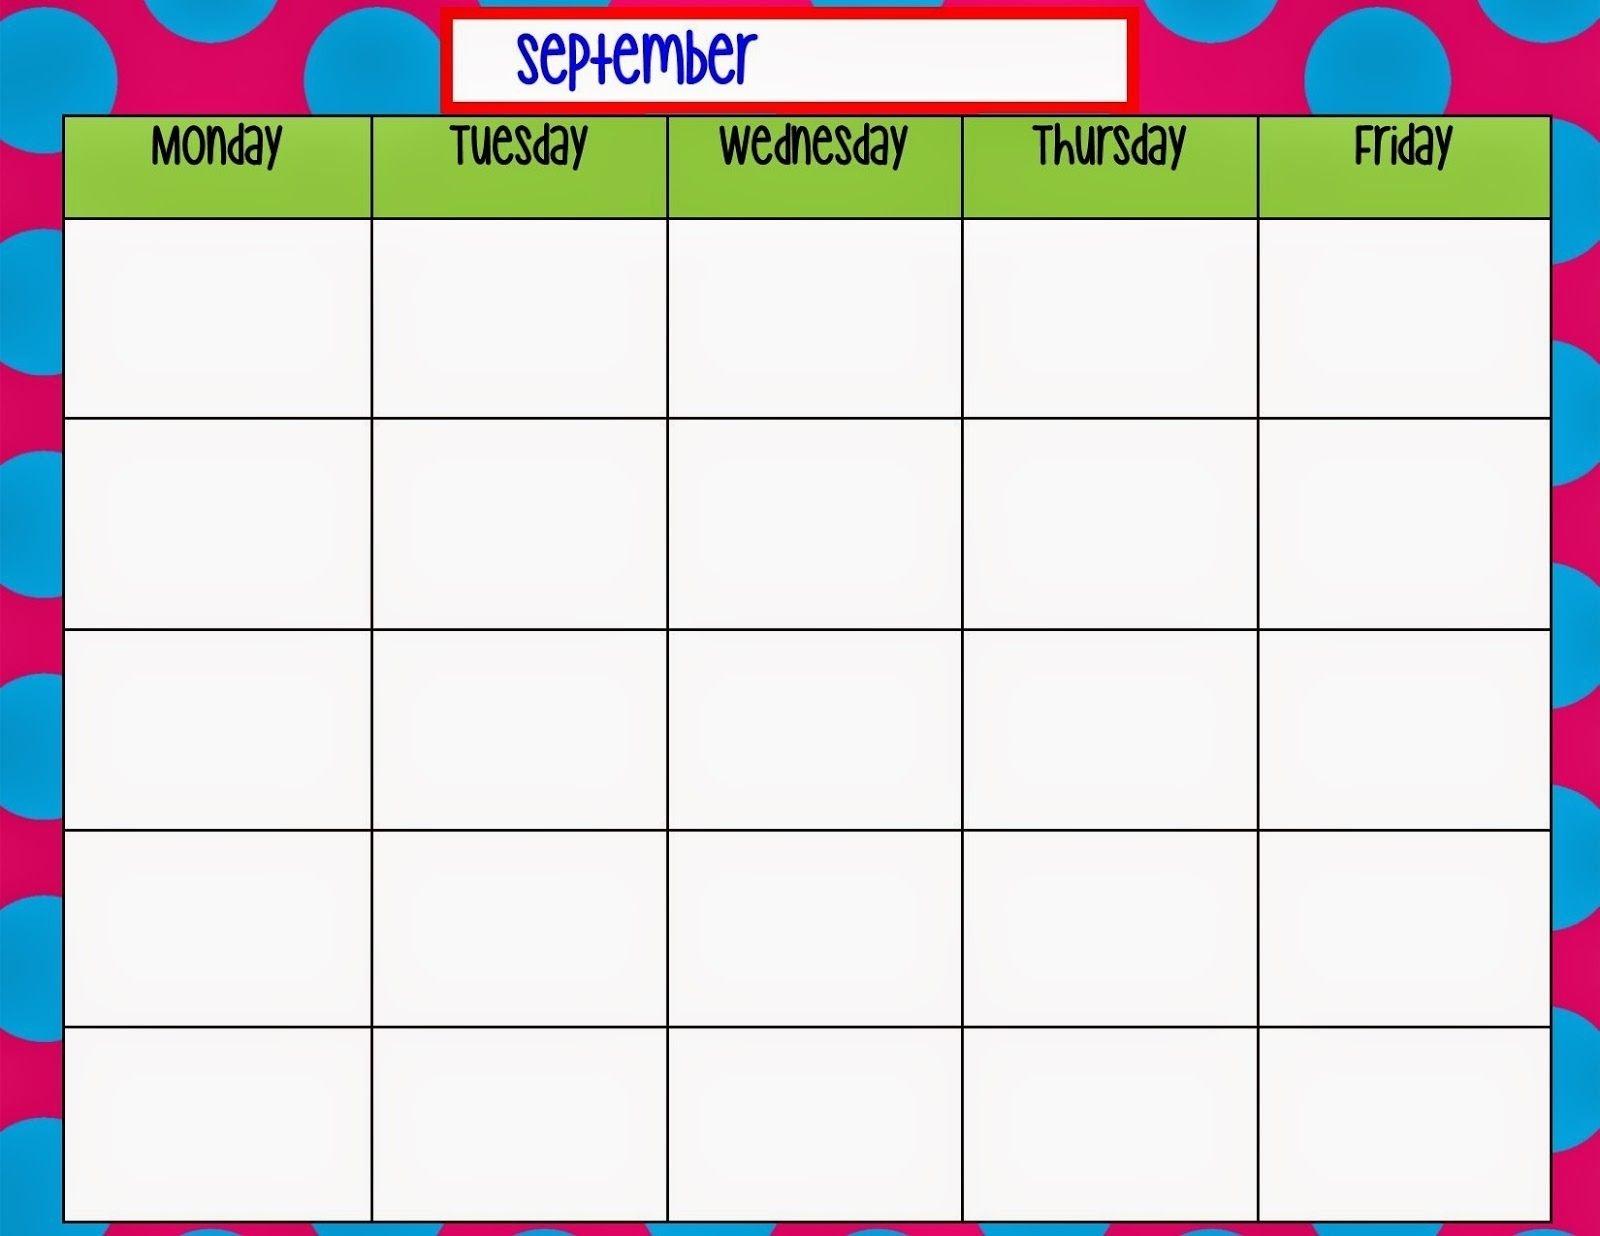 Blank Monday Through Friday Weekly Calendar Without Free Monthly Monday Through Friday Calenar